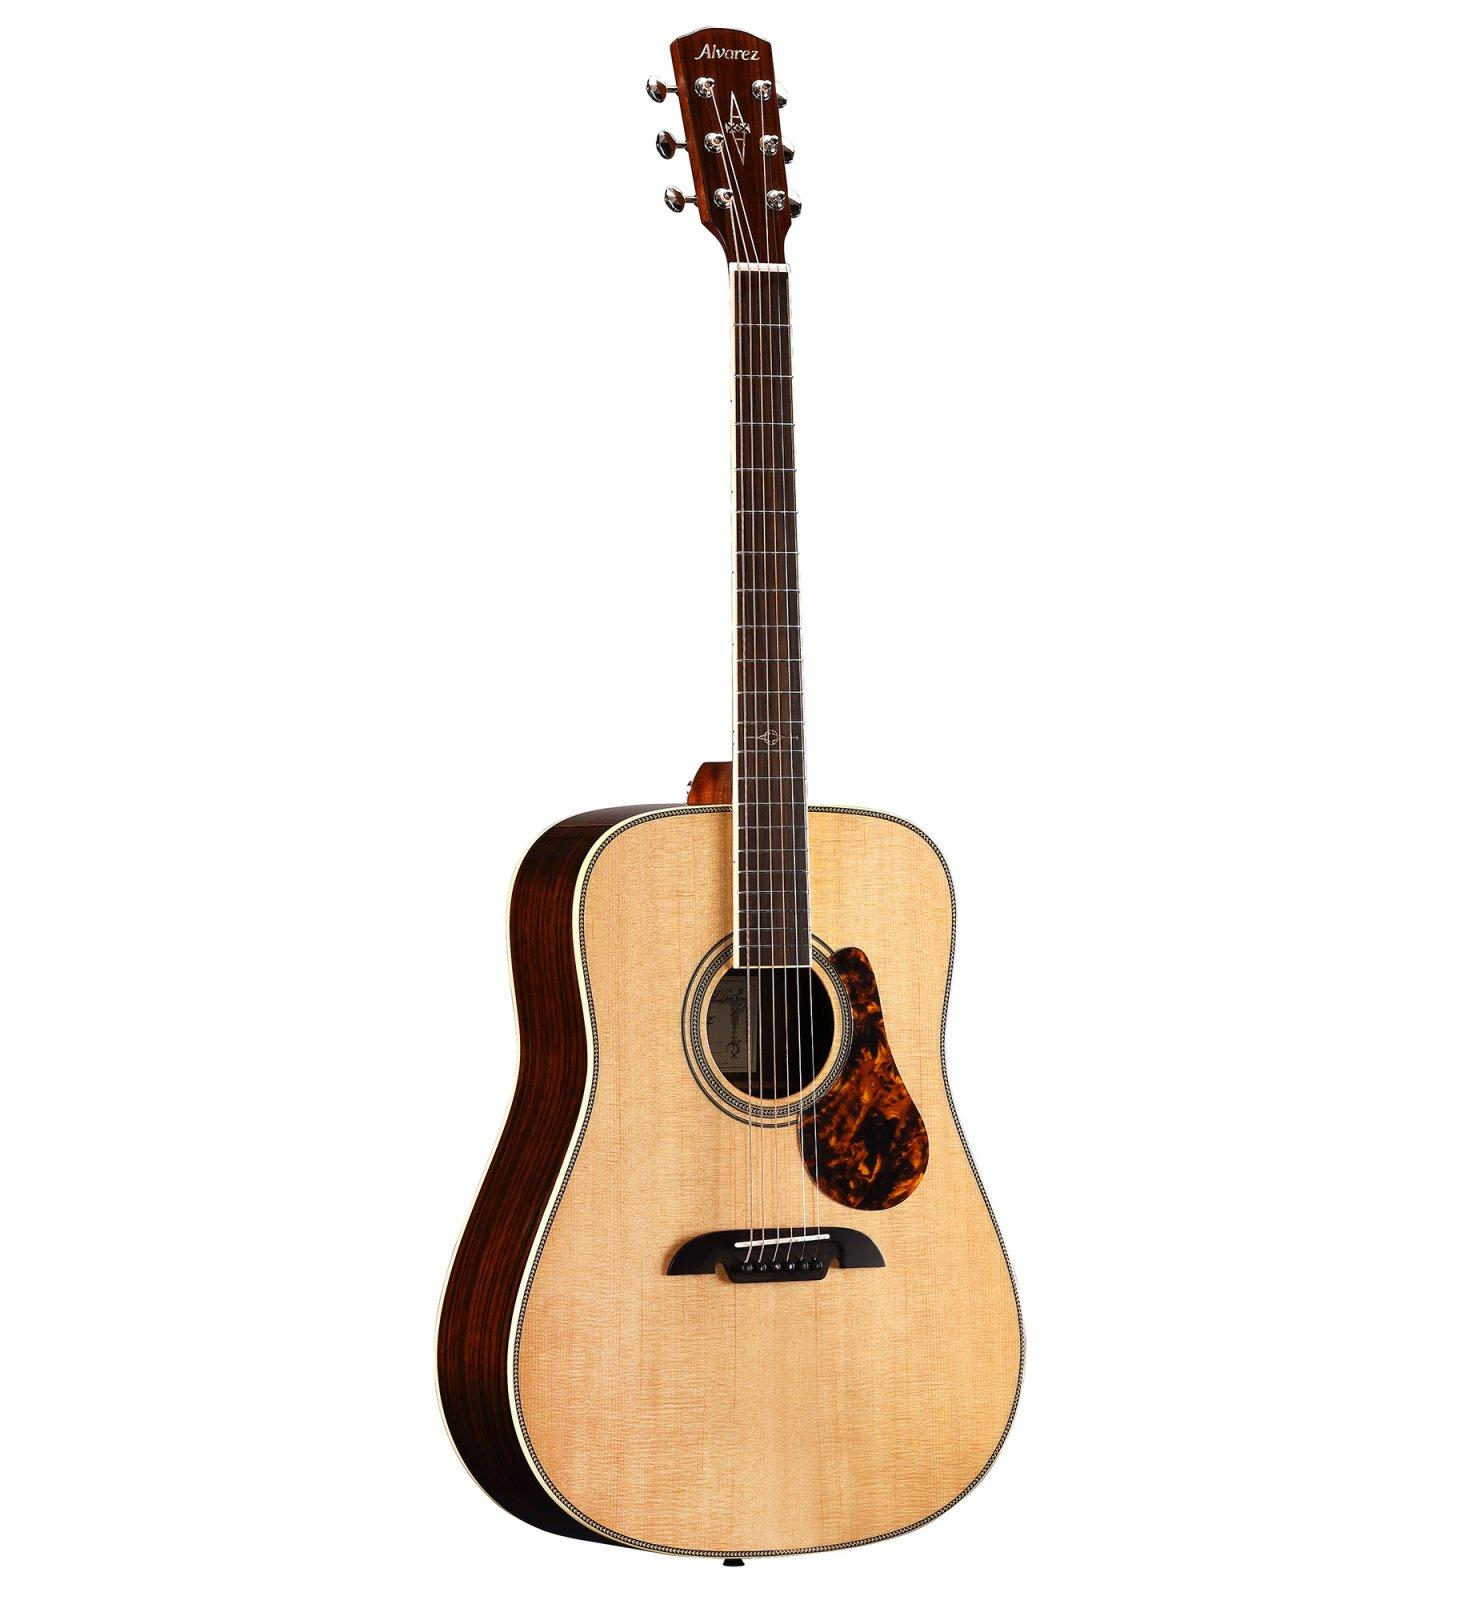 Alvarez MD70EBG Masterworks Dreadnought Bluegrass Acoustic/Electric Guitar with Flexicase